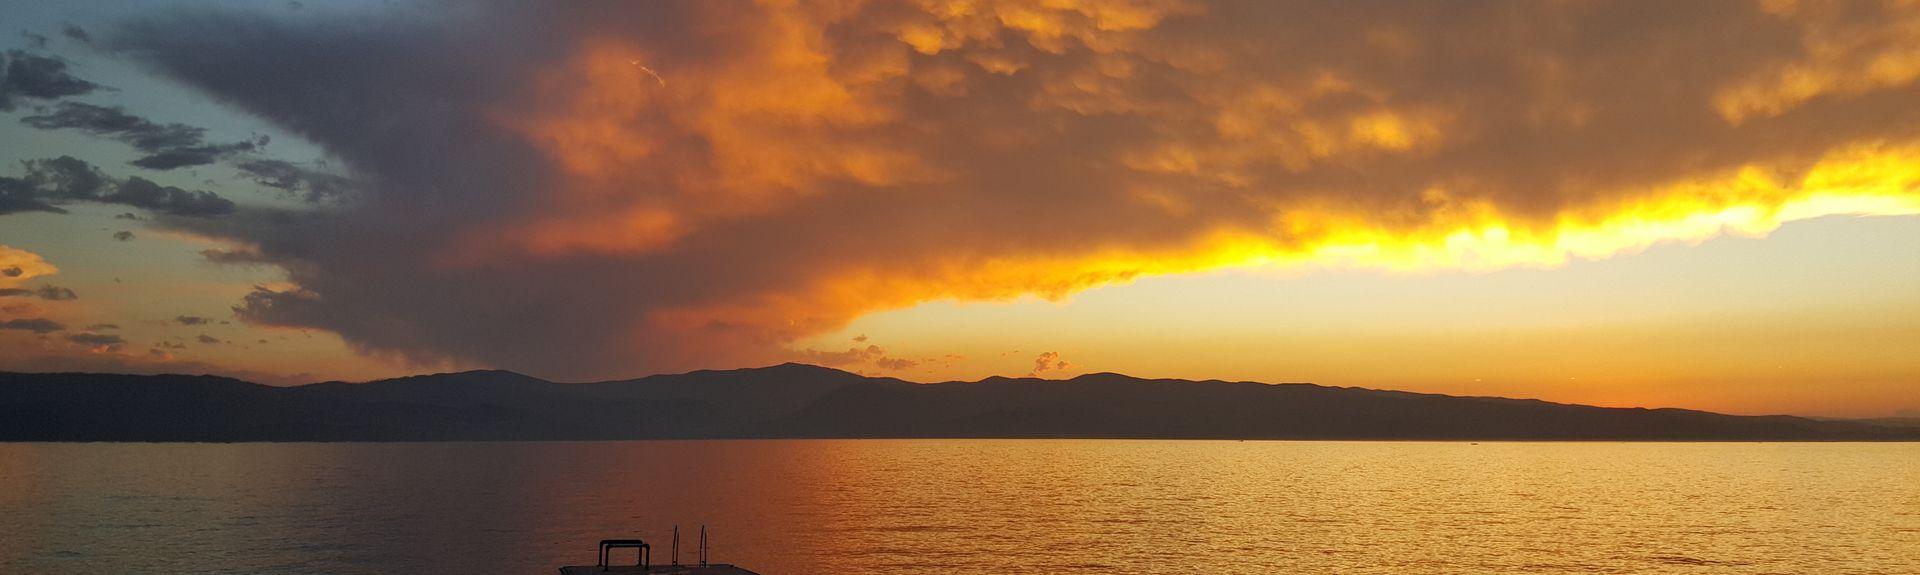 Swan Lake, MT, USA